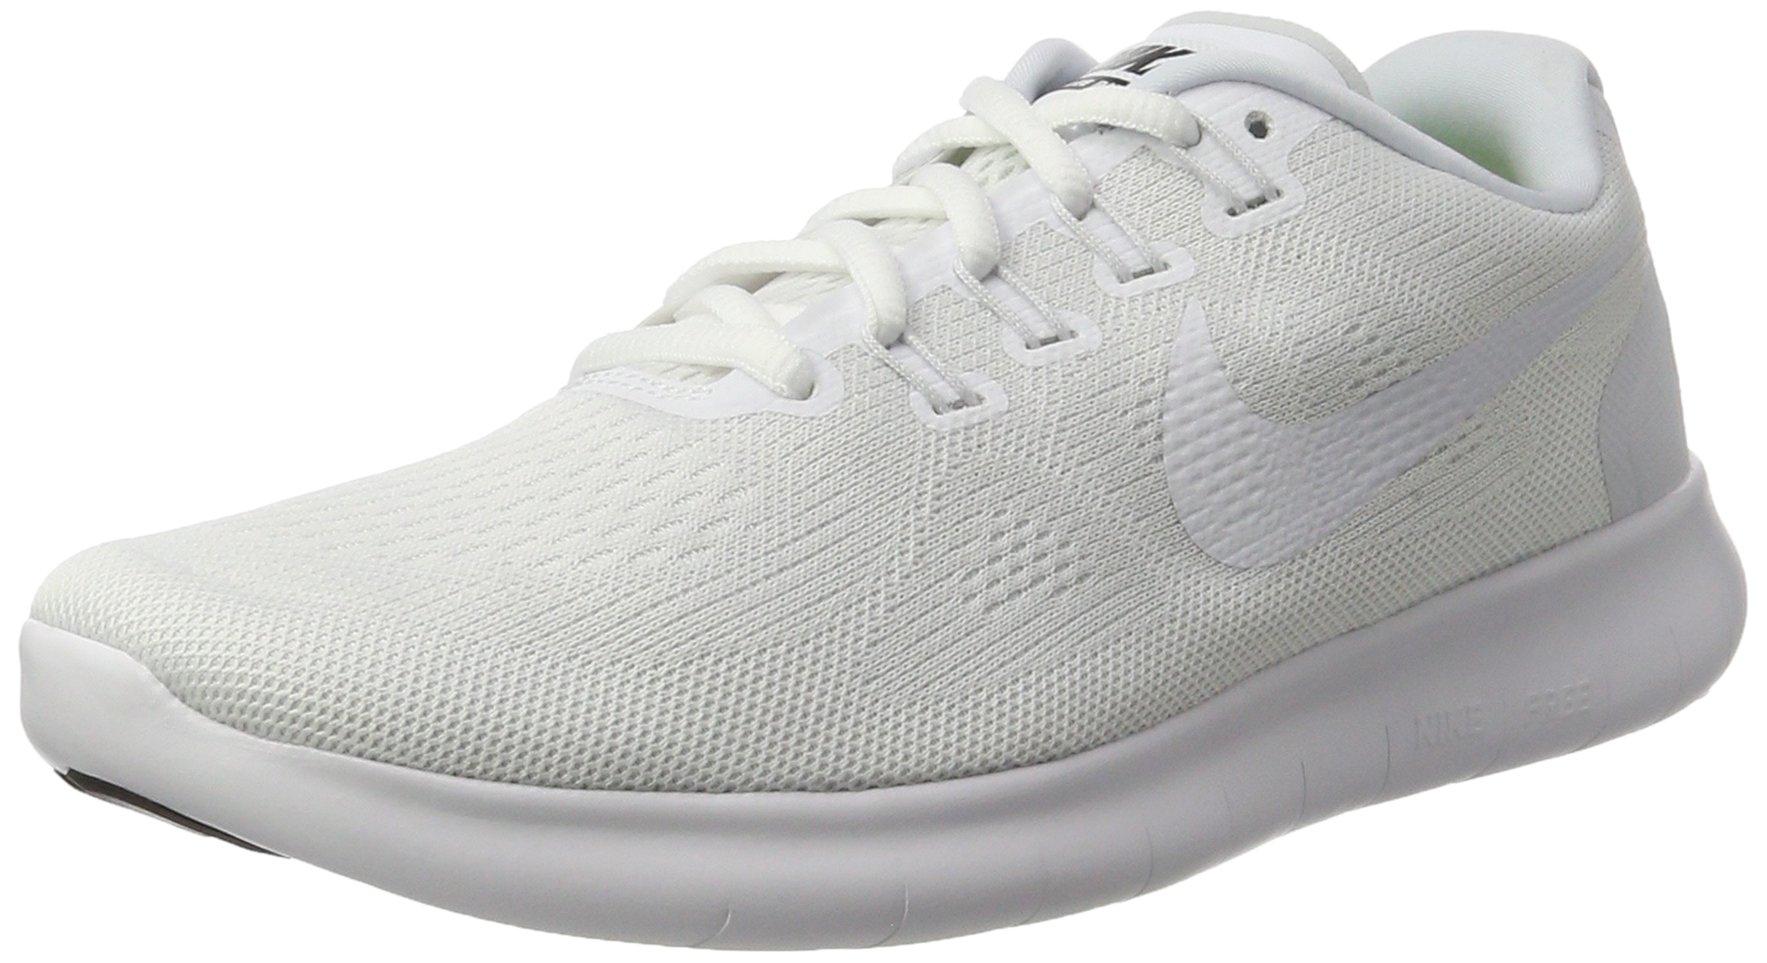 fc8fd2b6697 Galleon - NIKE Men s Free RN 2017 Running Shoe White Black Pure Platinum  Size 10 M US